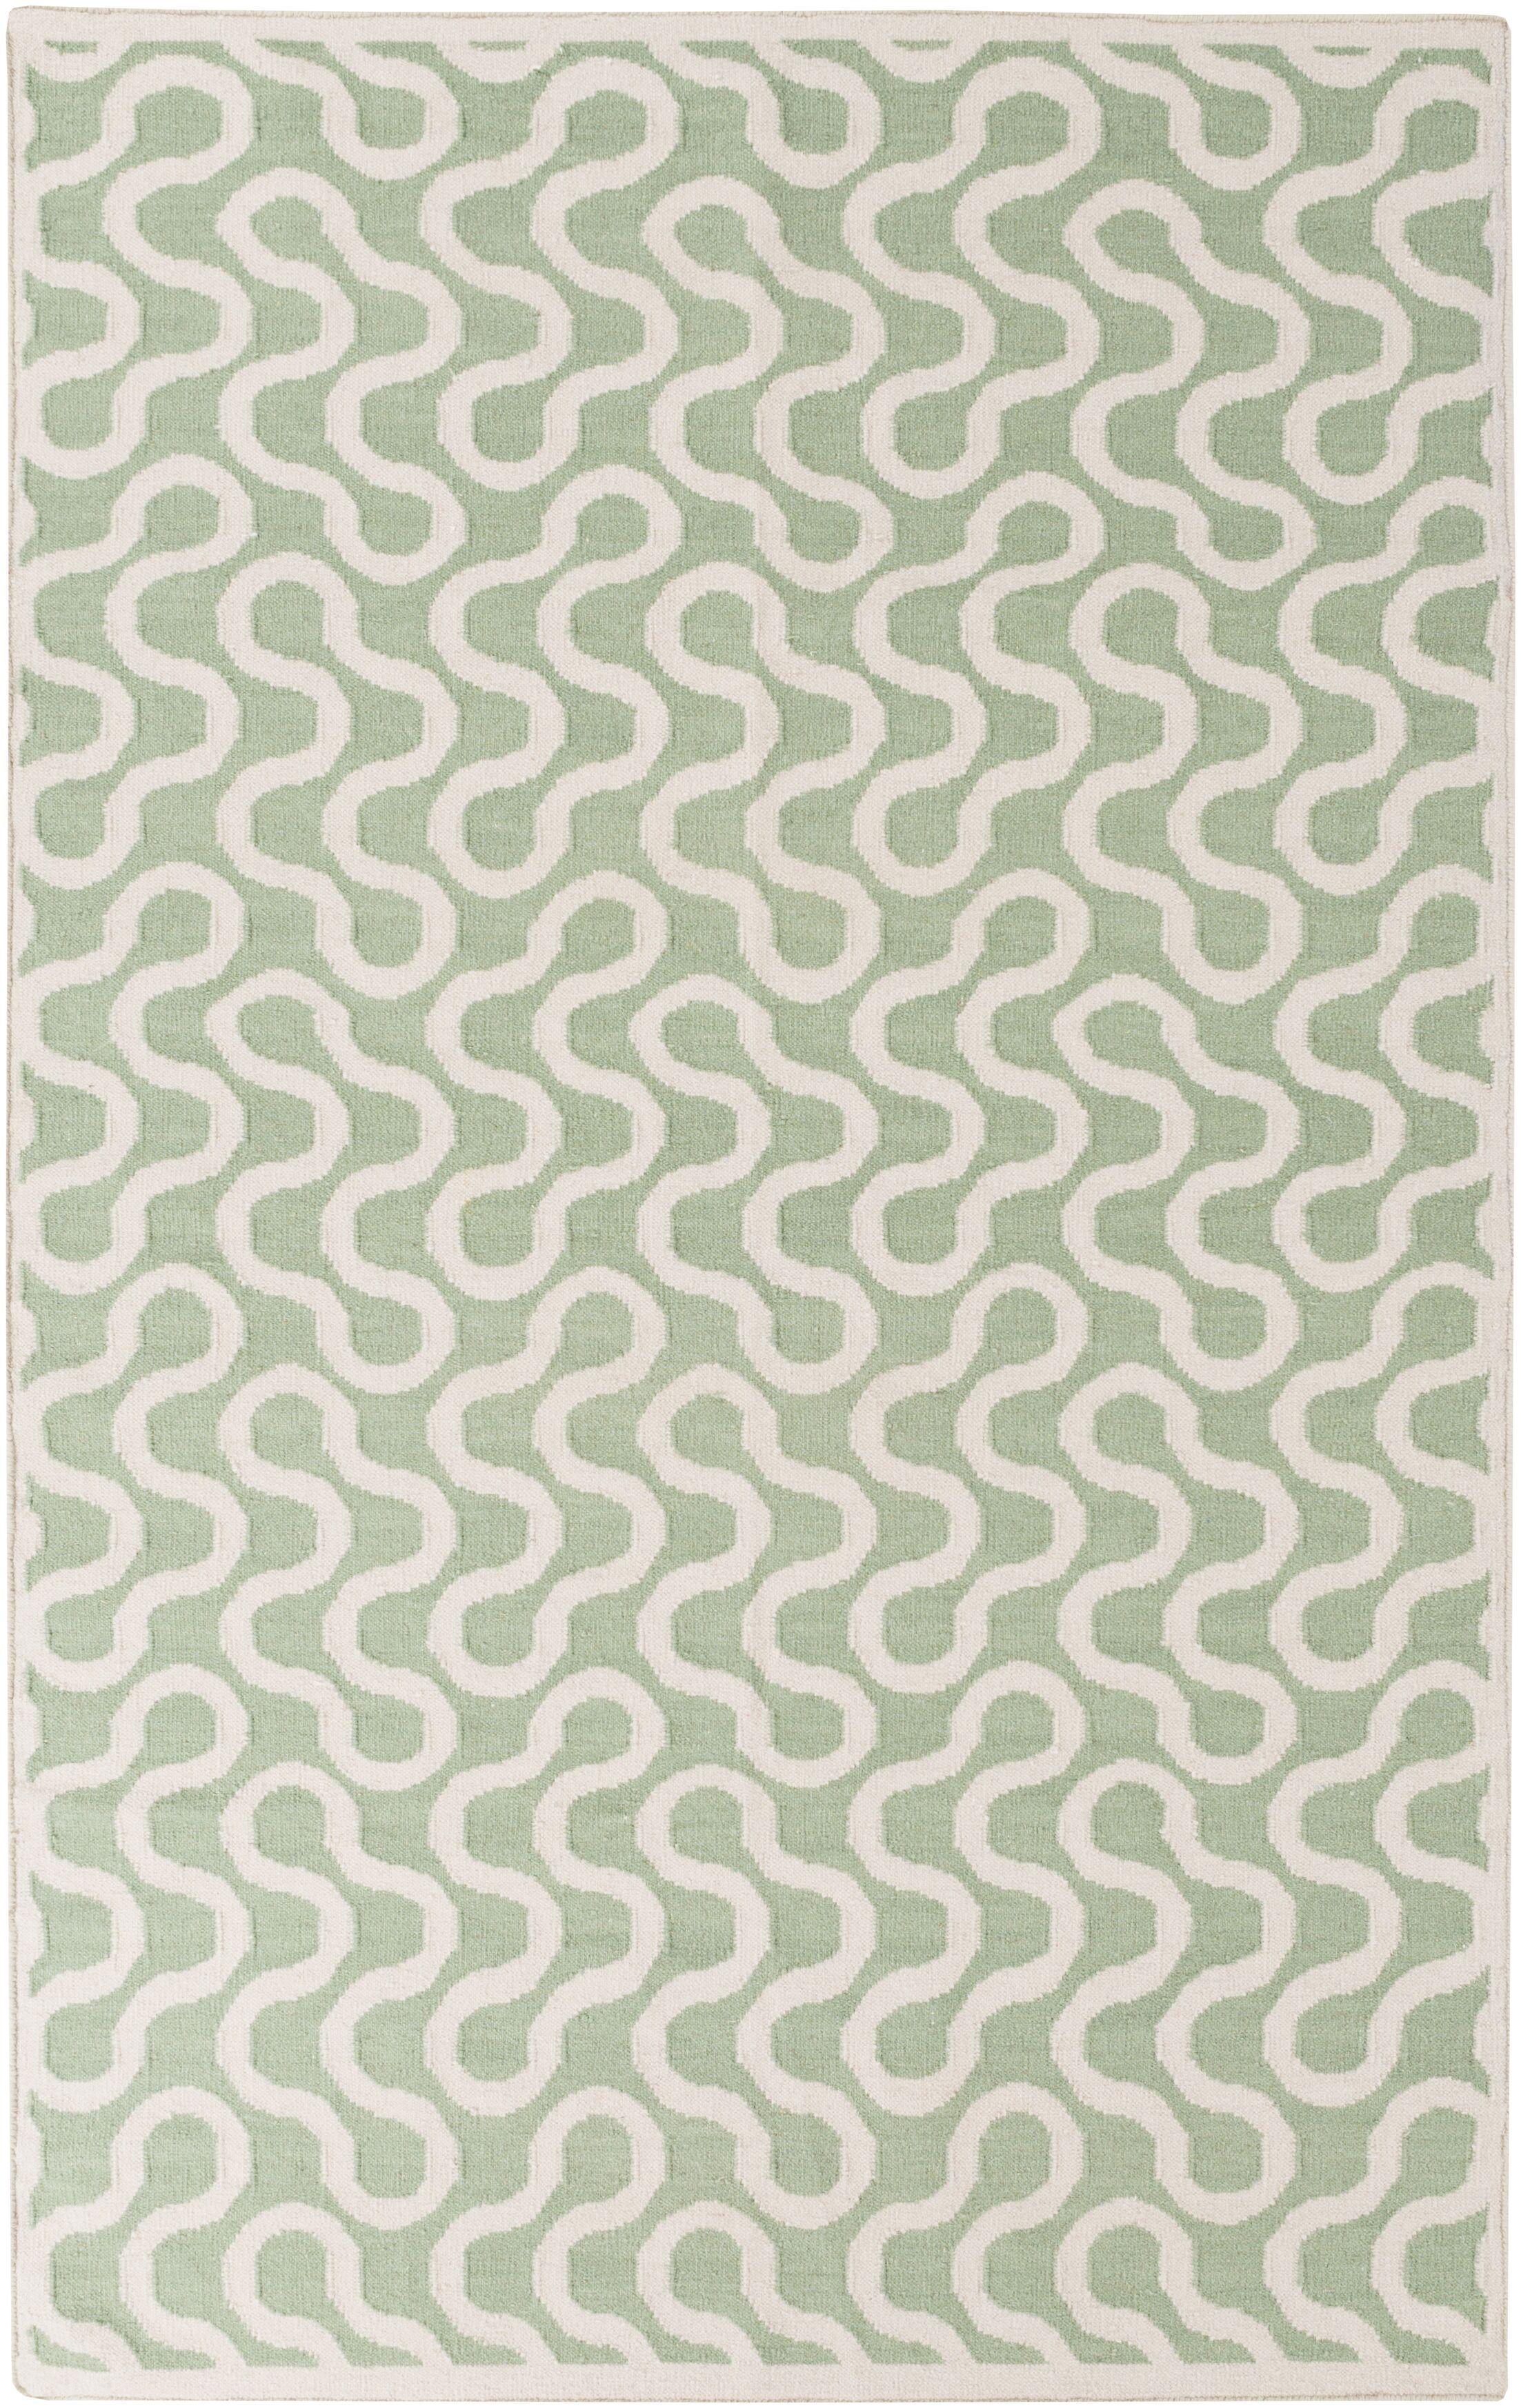 Native Sea Foam Geometric Area Rug Rug Size: Rectangle 8' x 11'